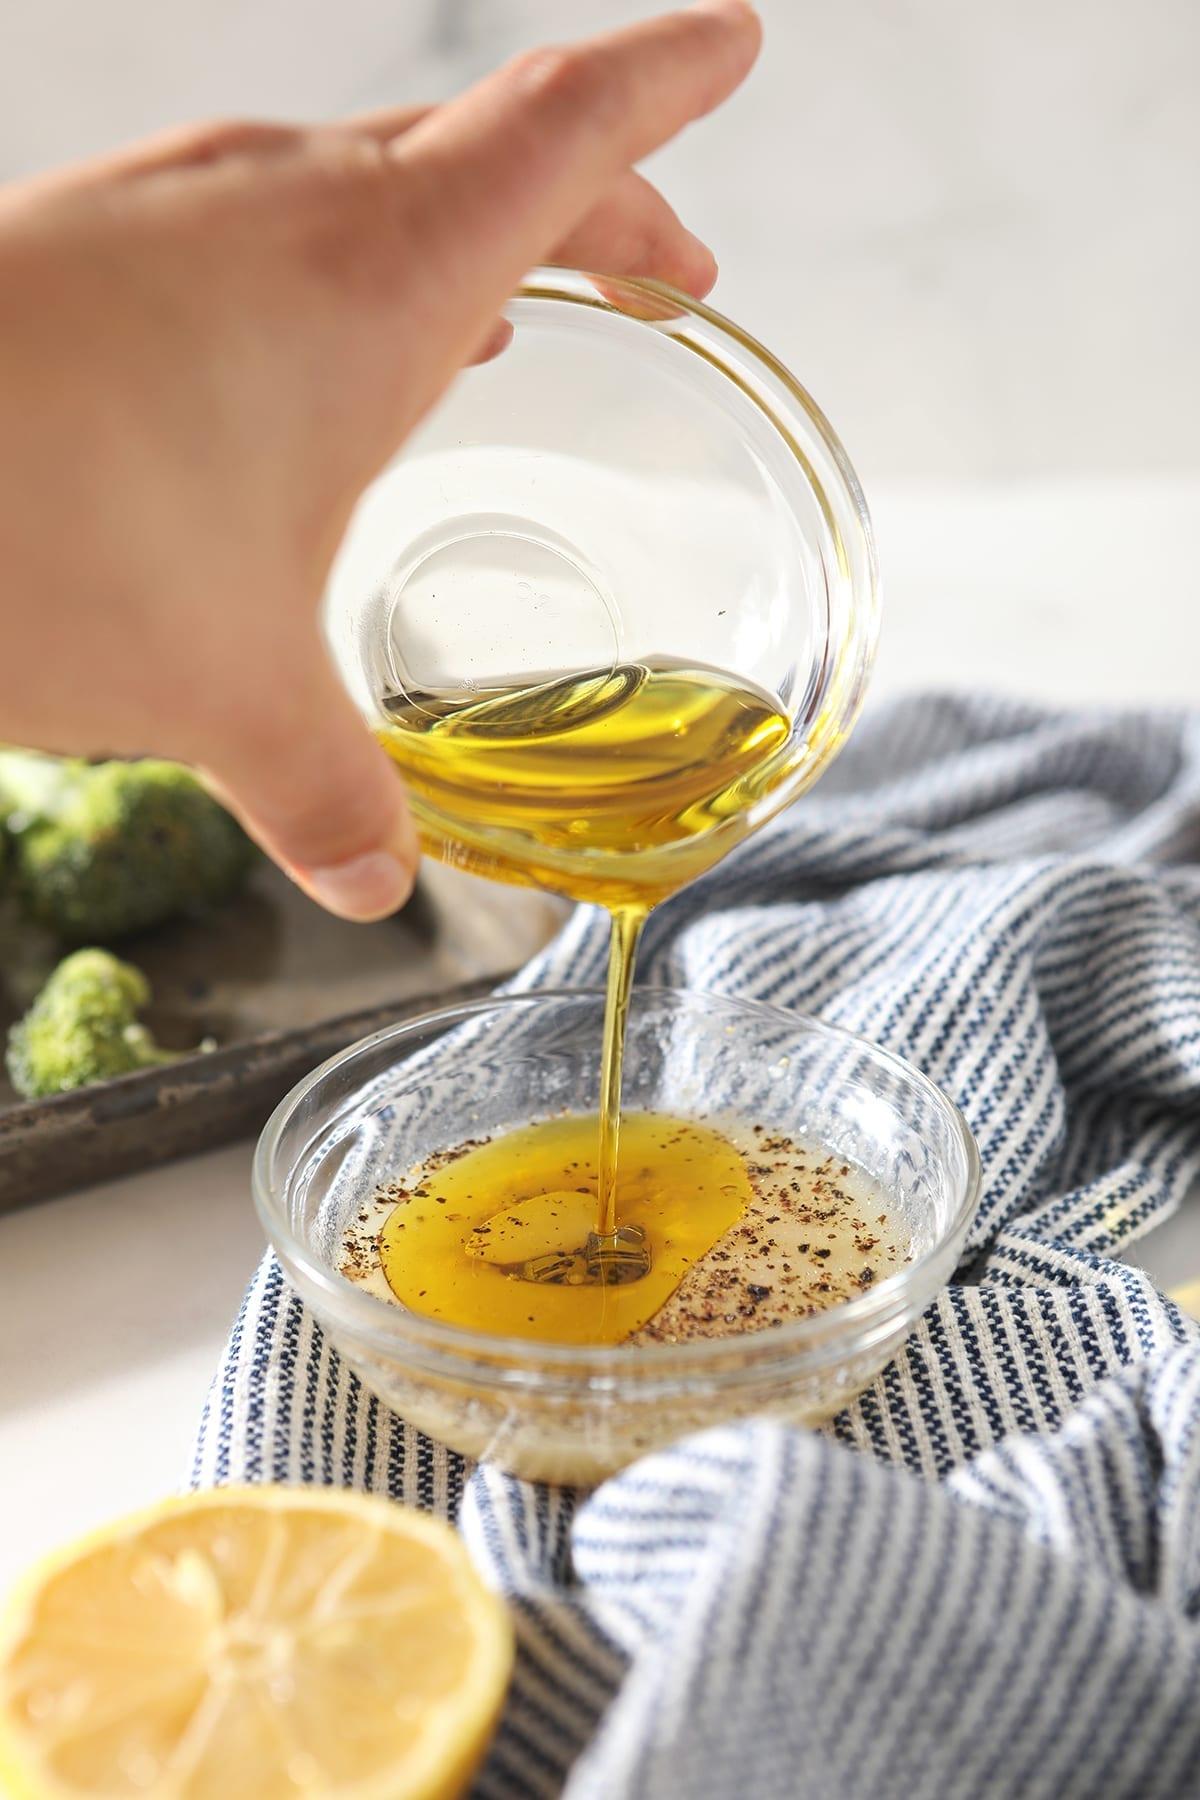 Oil pours into a lemon juice mixture in a clear glass bowl